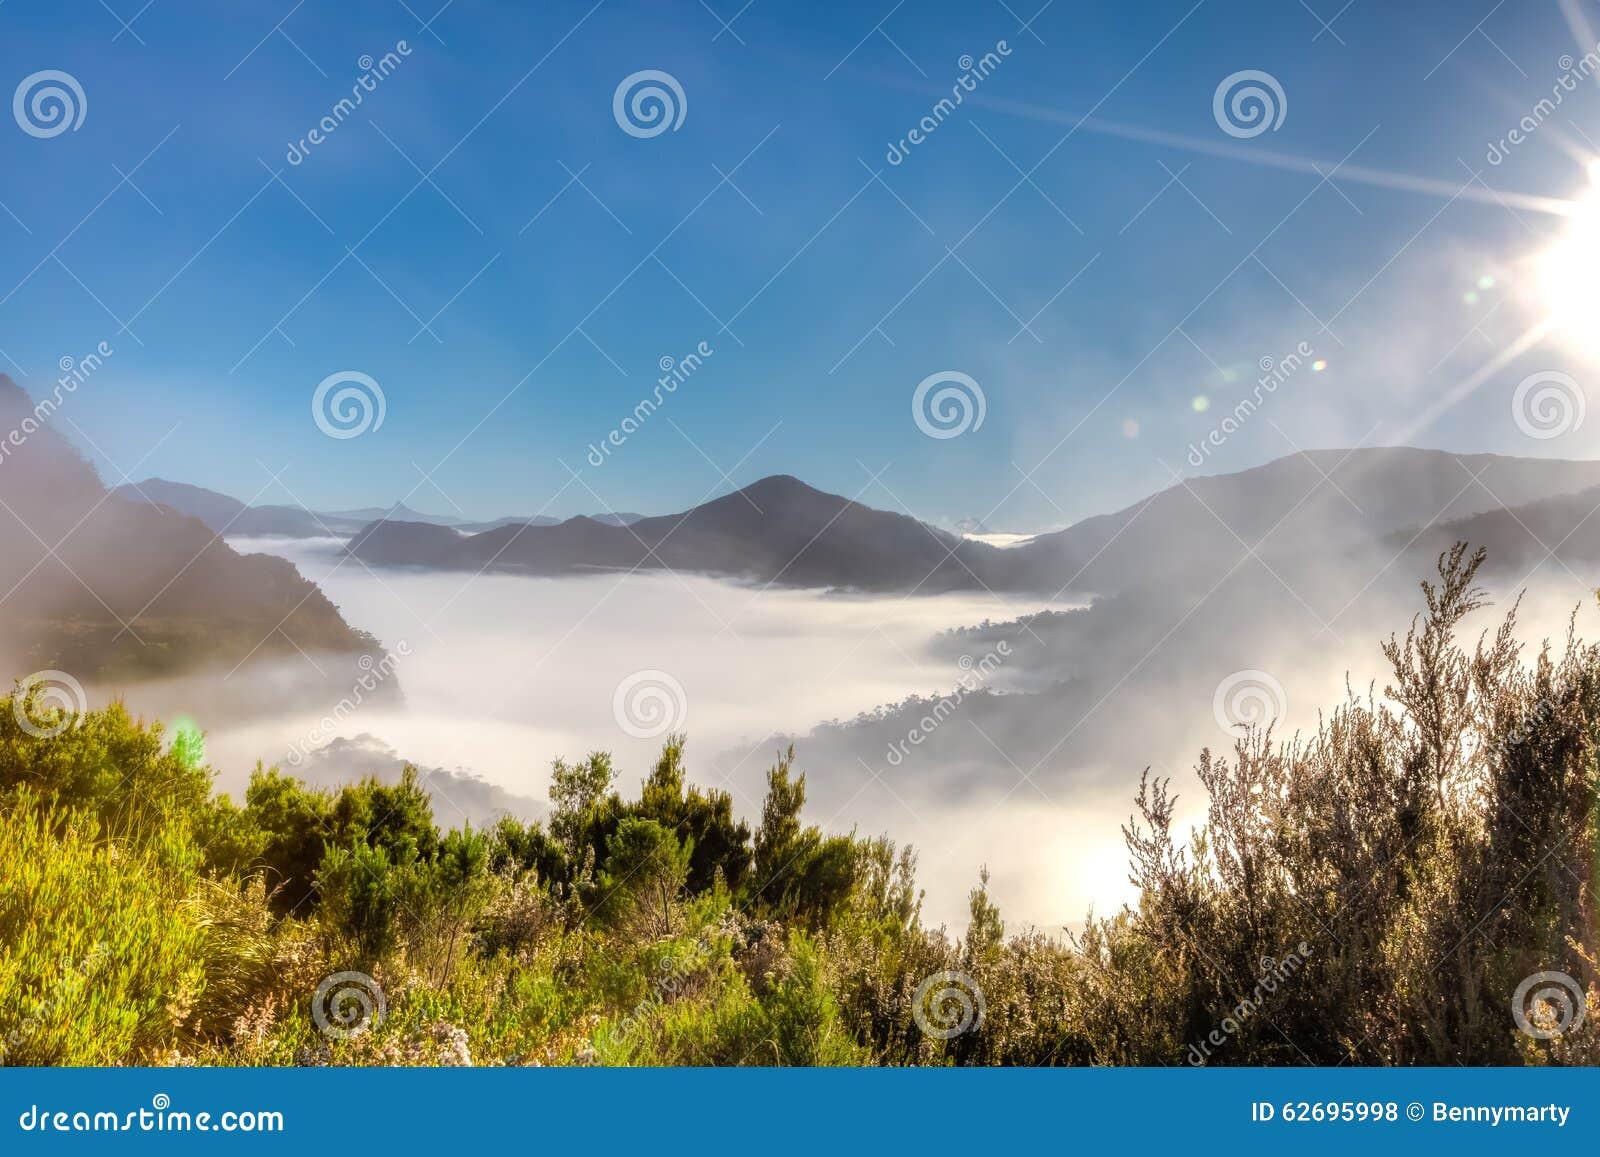 Surreal morning fog